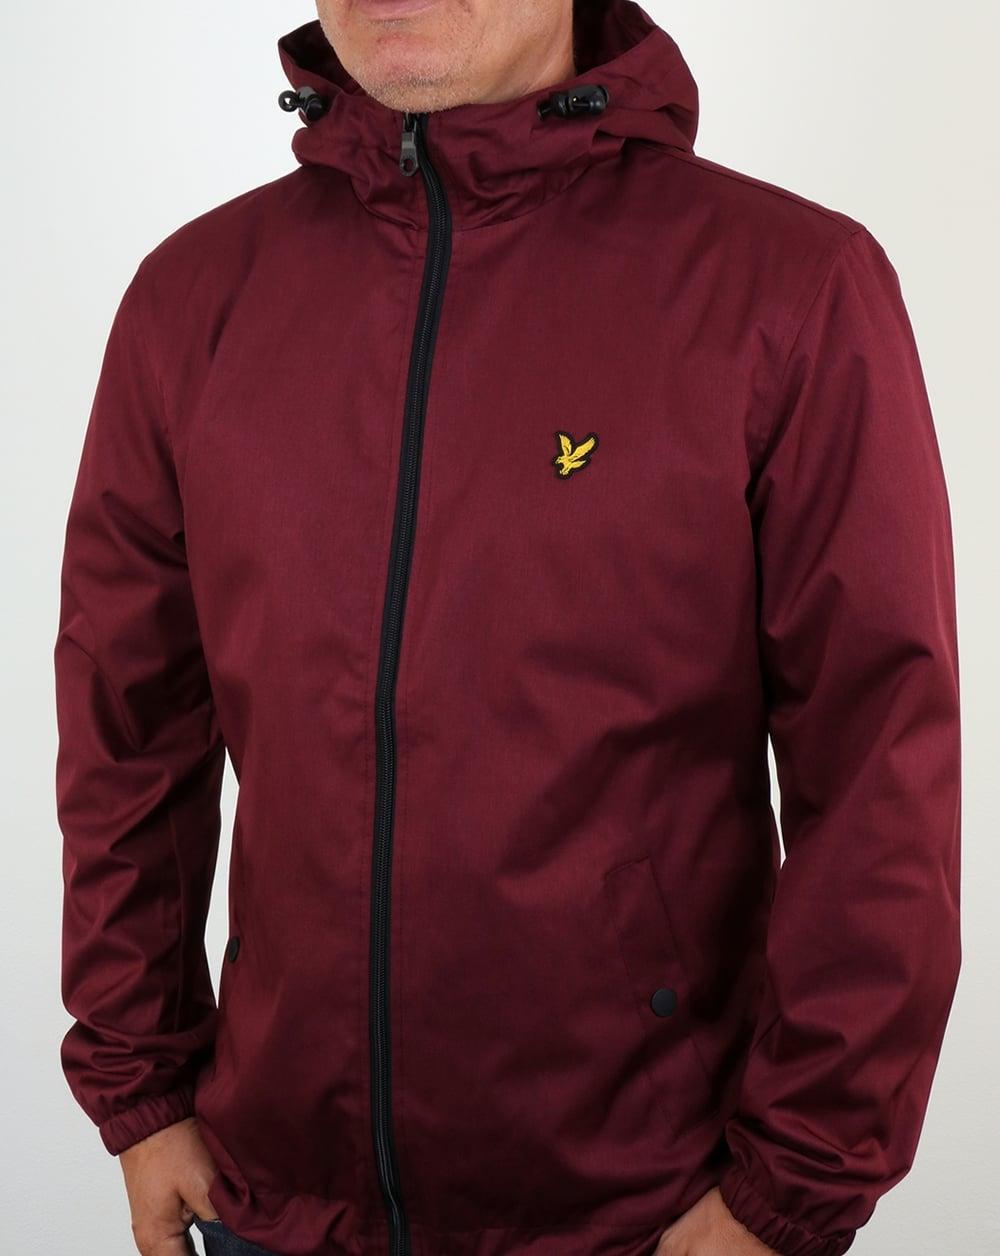 lyle and scott zip through hooded jacket claret marl coat parka mens. Black Bedroom Furniture Sets. Home Design Ideas